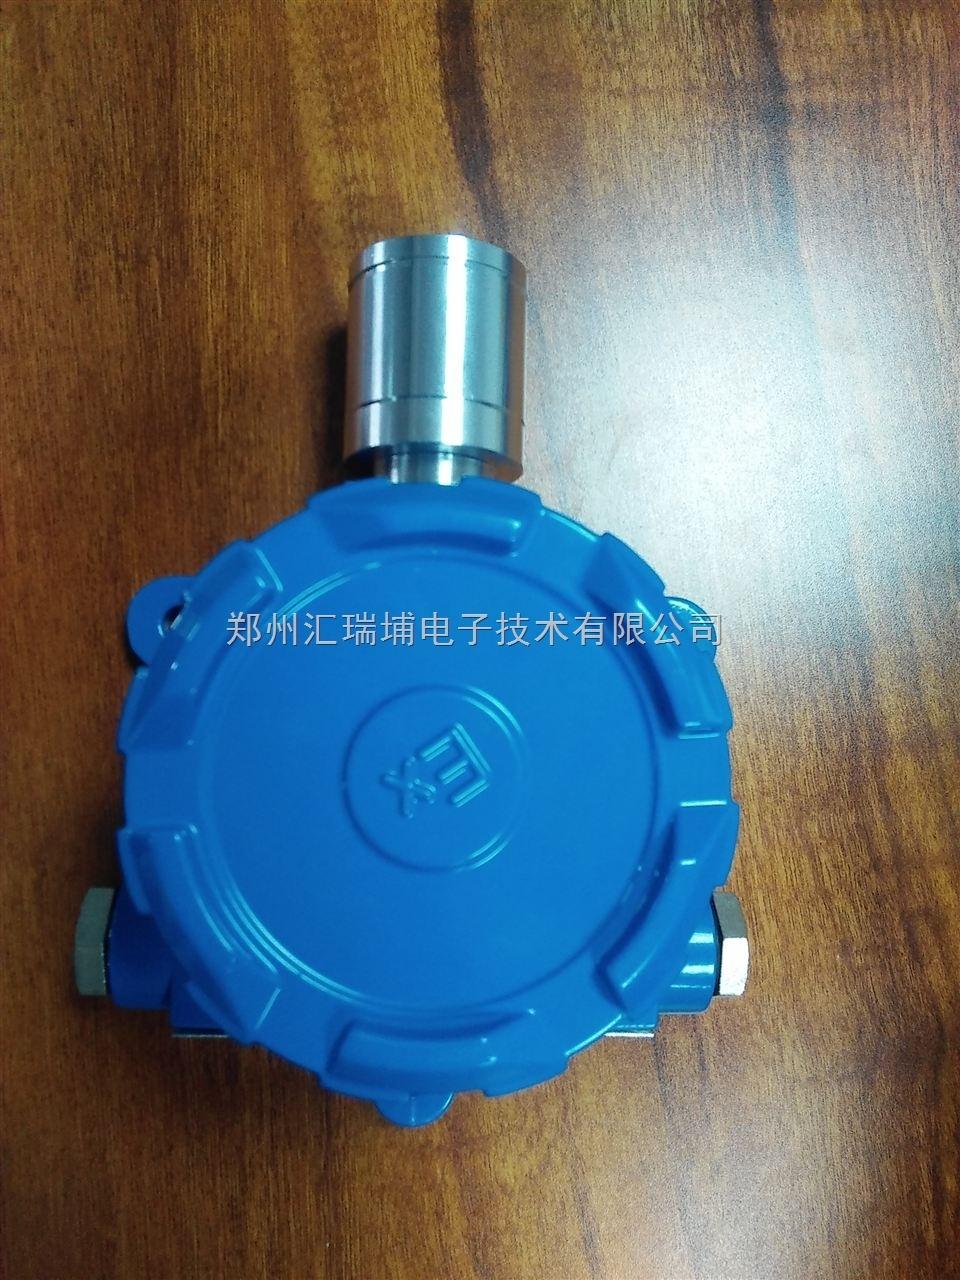 HRP-T1000气体报警器-点型无屏显可燃气体探测器